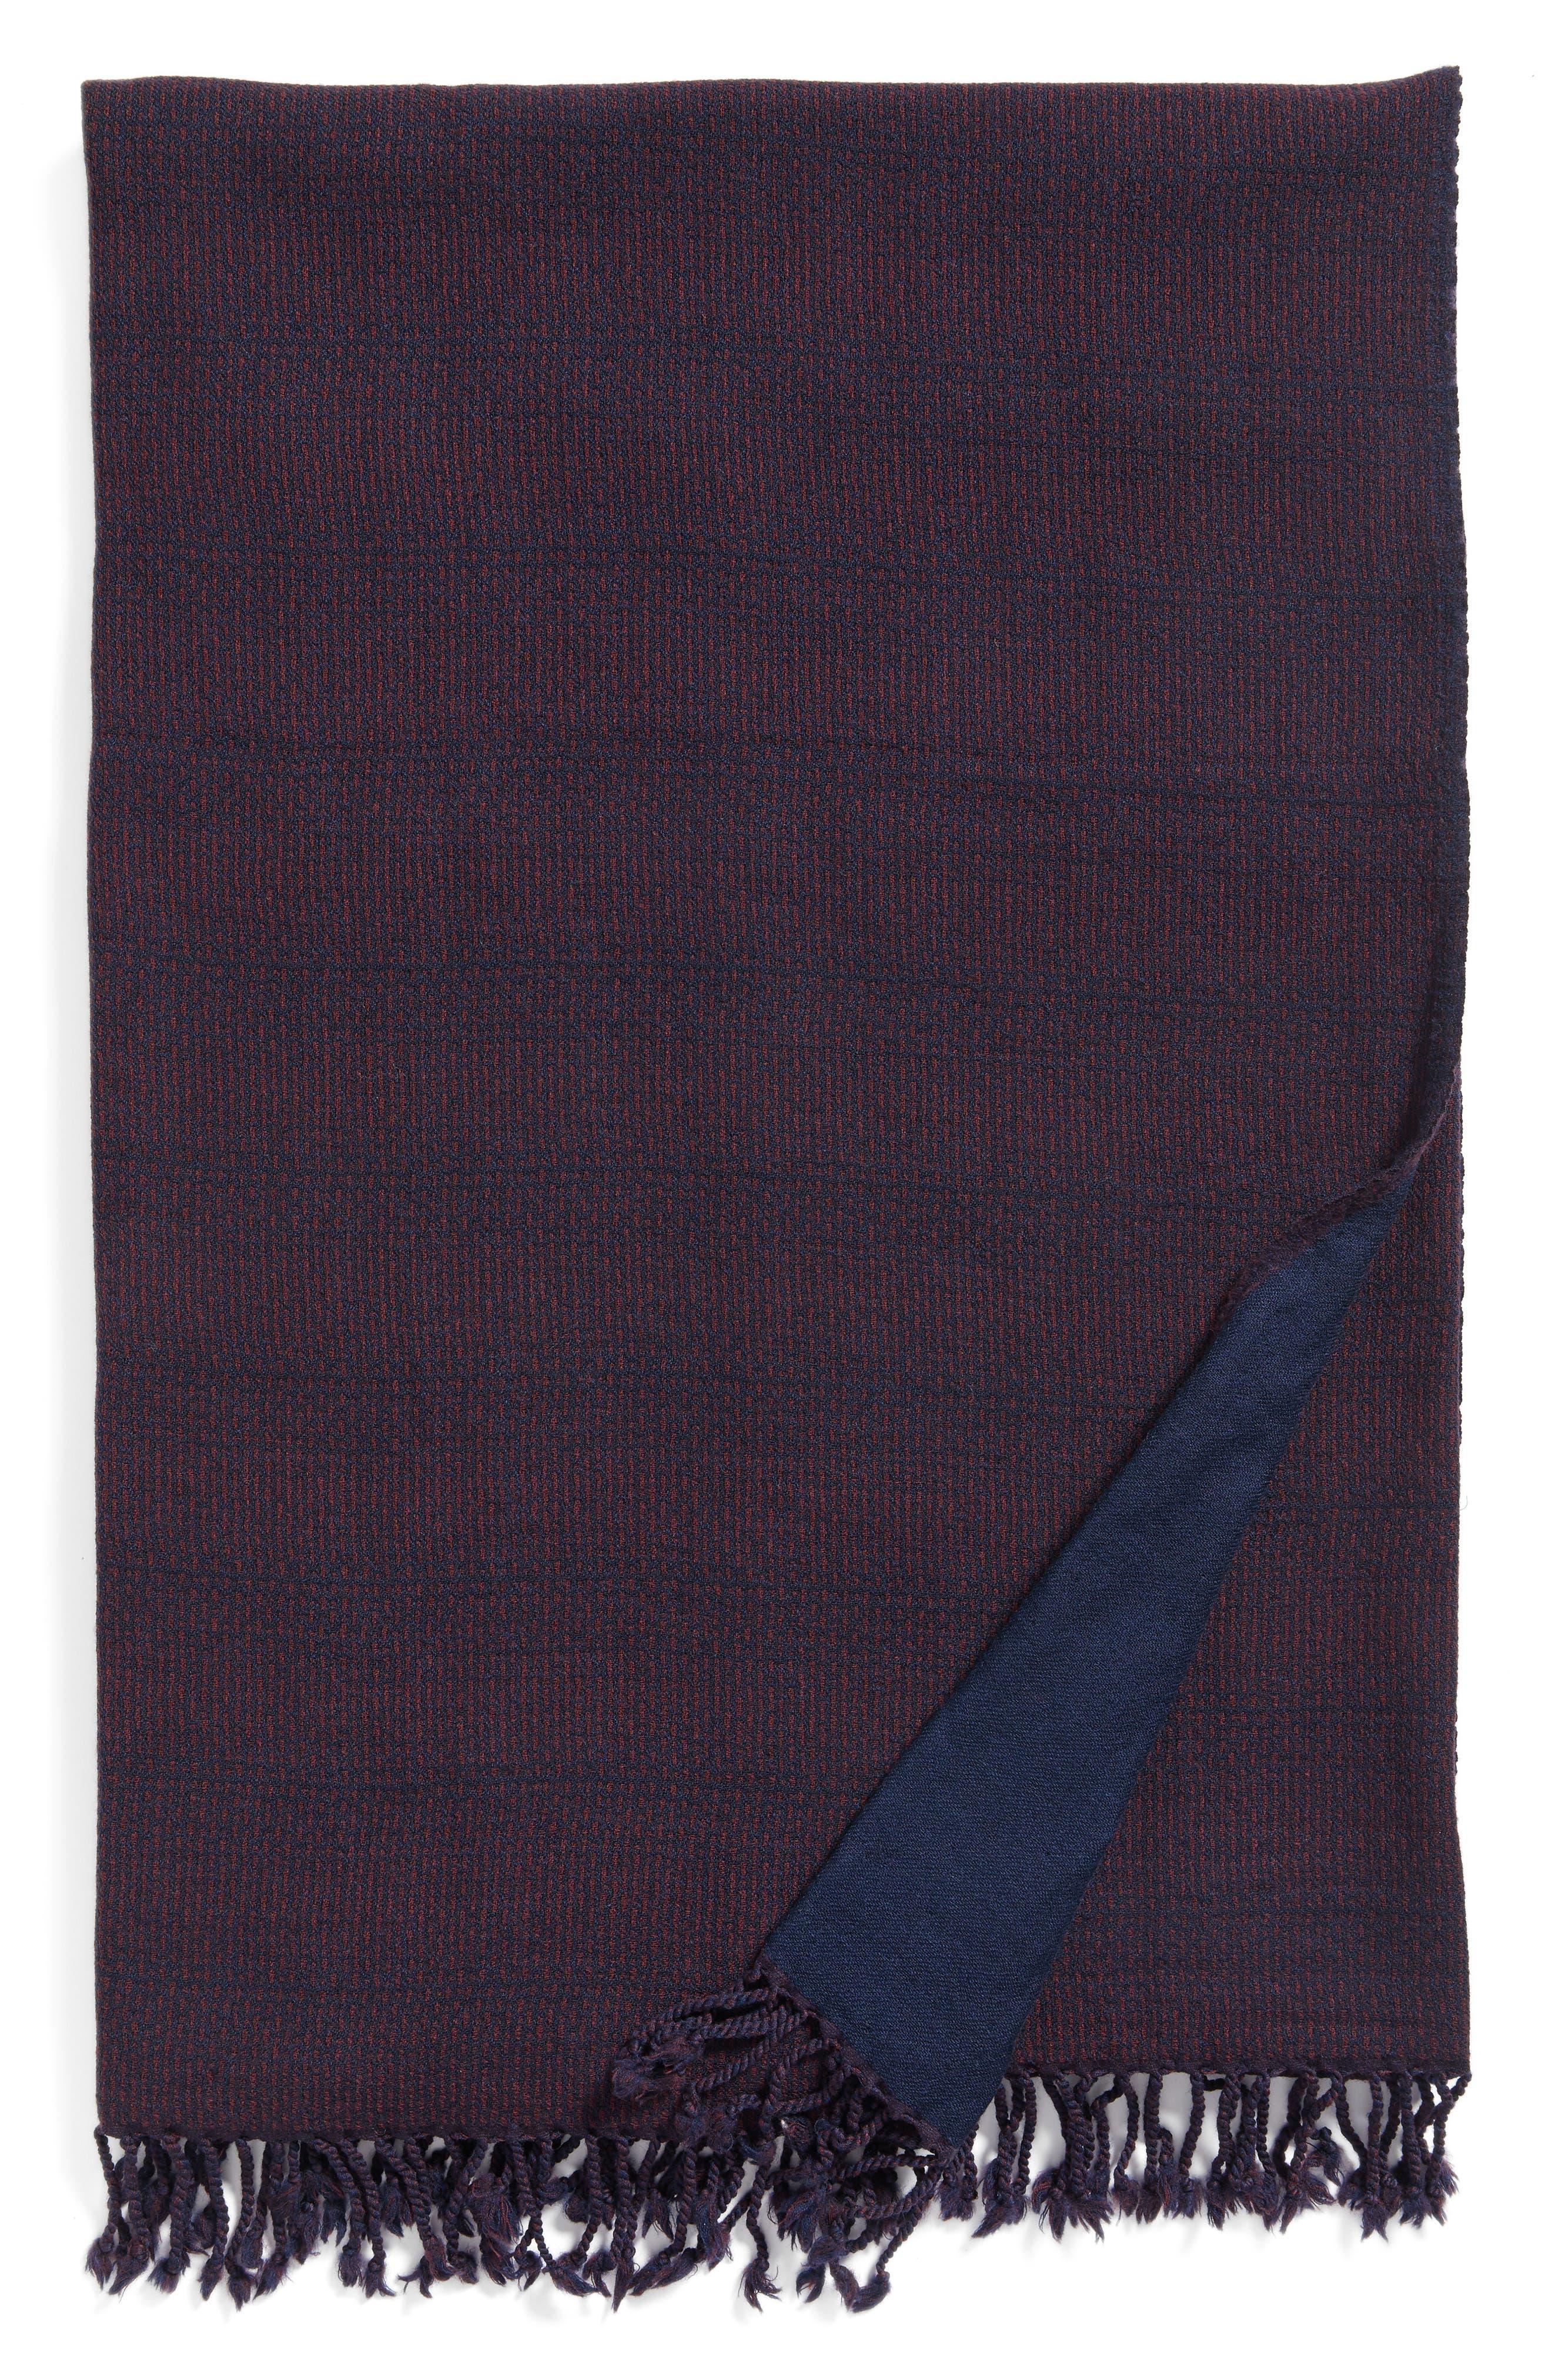 Modern Staples Stipple Stripe Double Face Merino Wool Throw